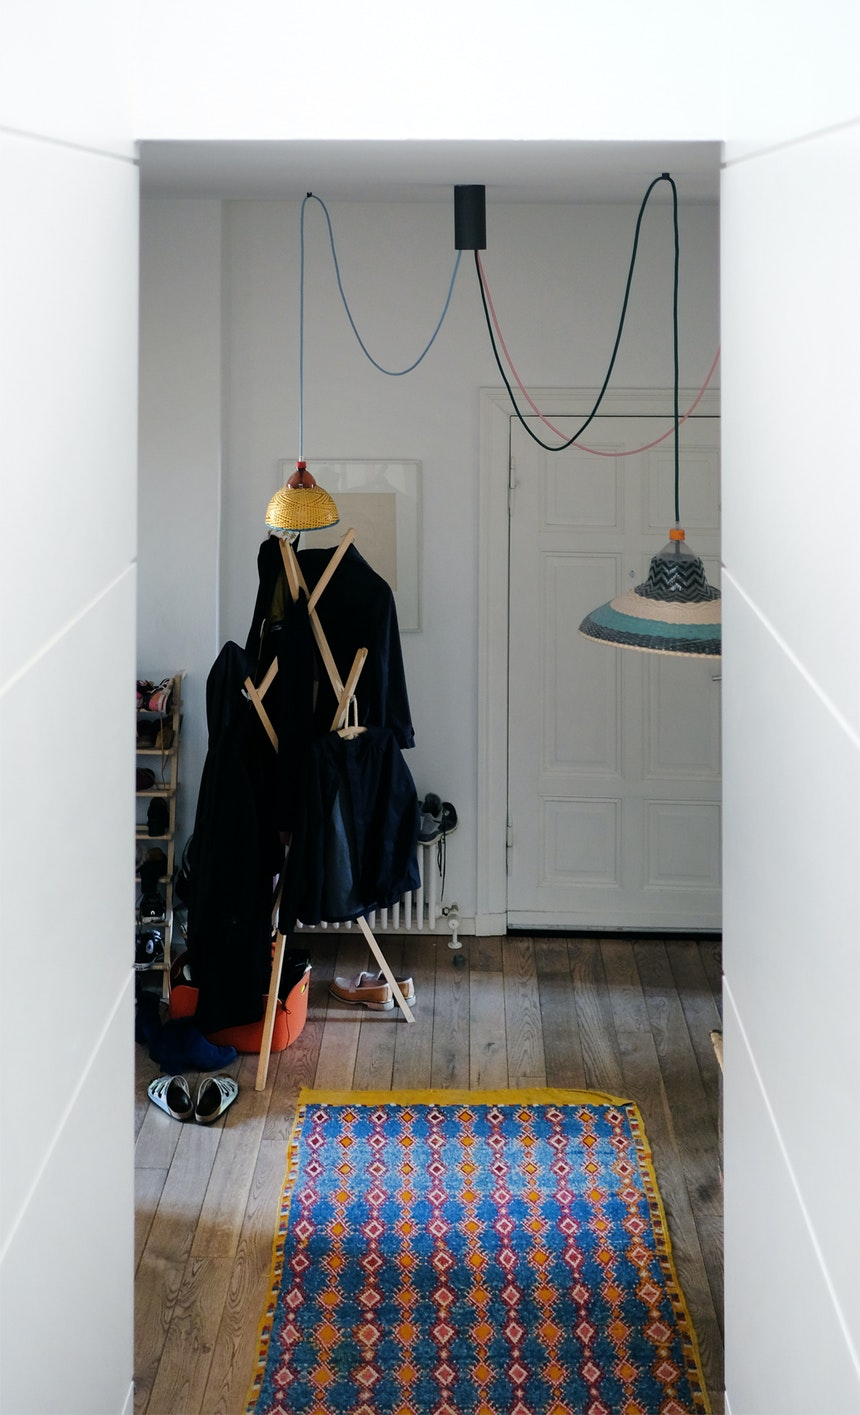 Treppenblick – Pet Lamps, Design Alvaro Catalán, Garderobe »Hut ab«, Design Nils Holger Moormann